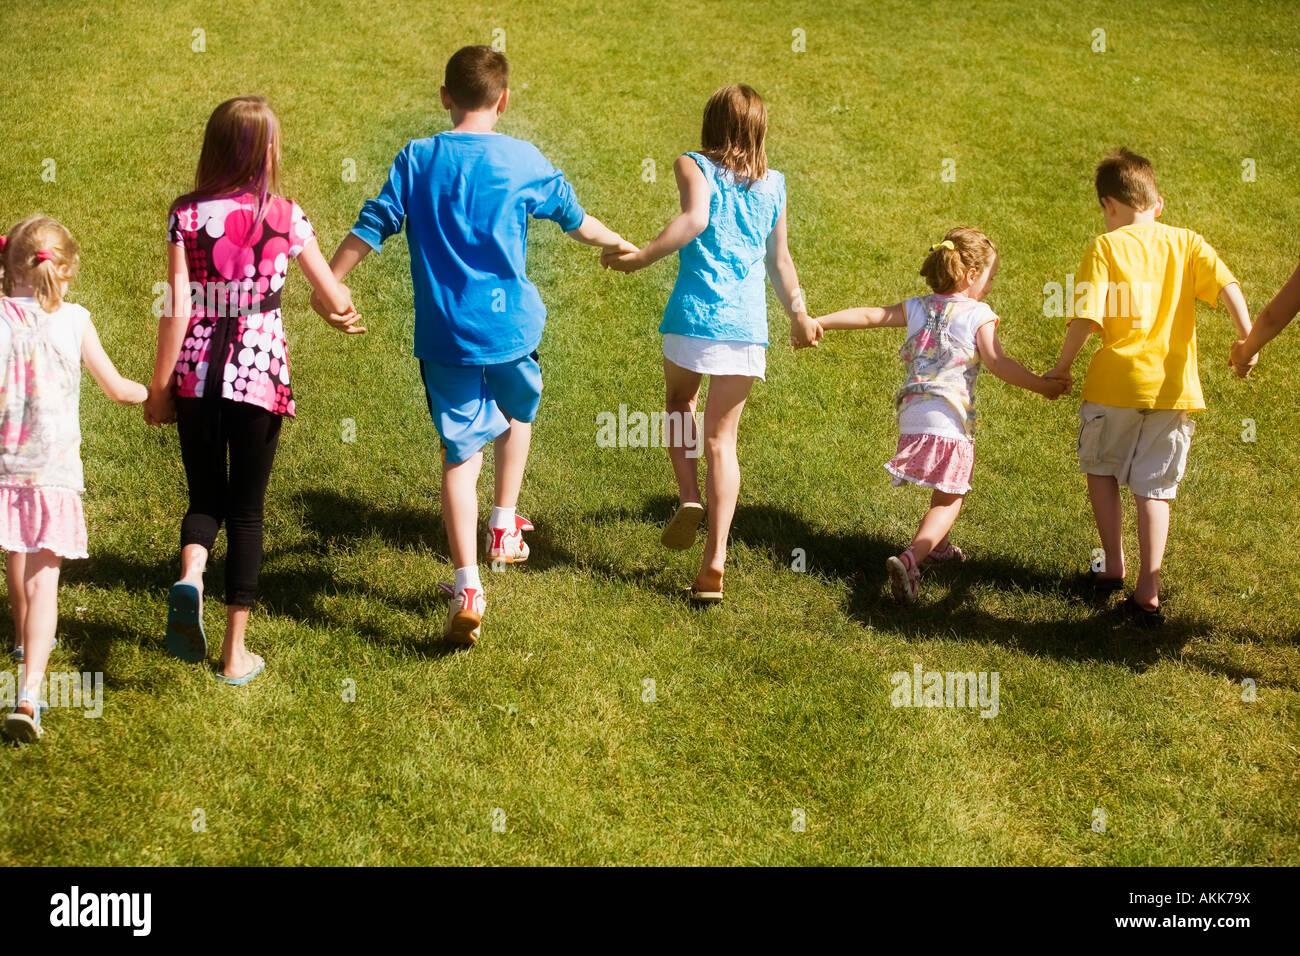 Rear view of children running - Stock Image